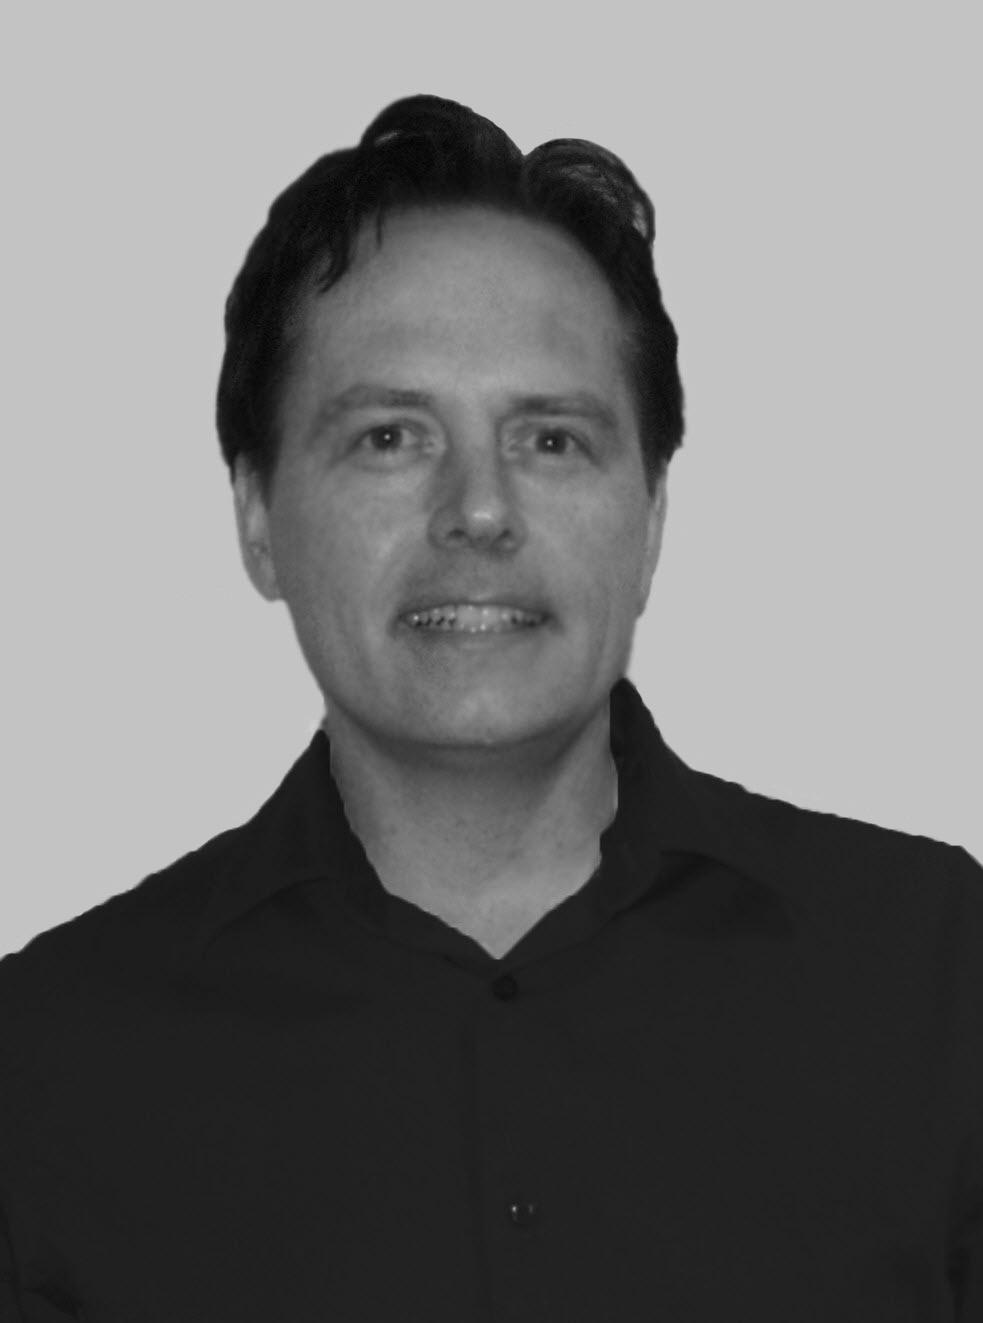 Todd Dobson